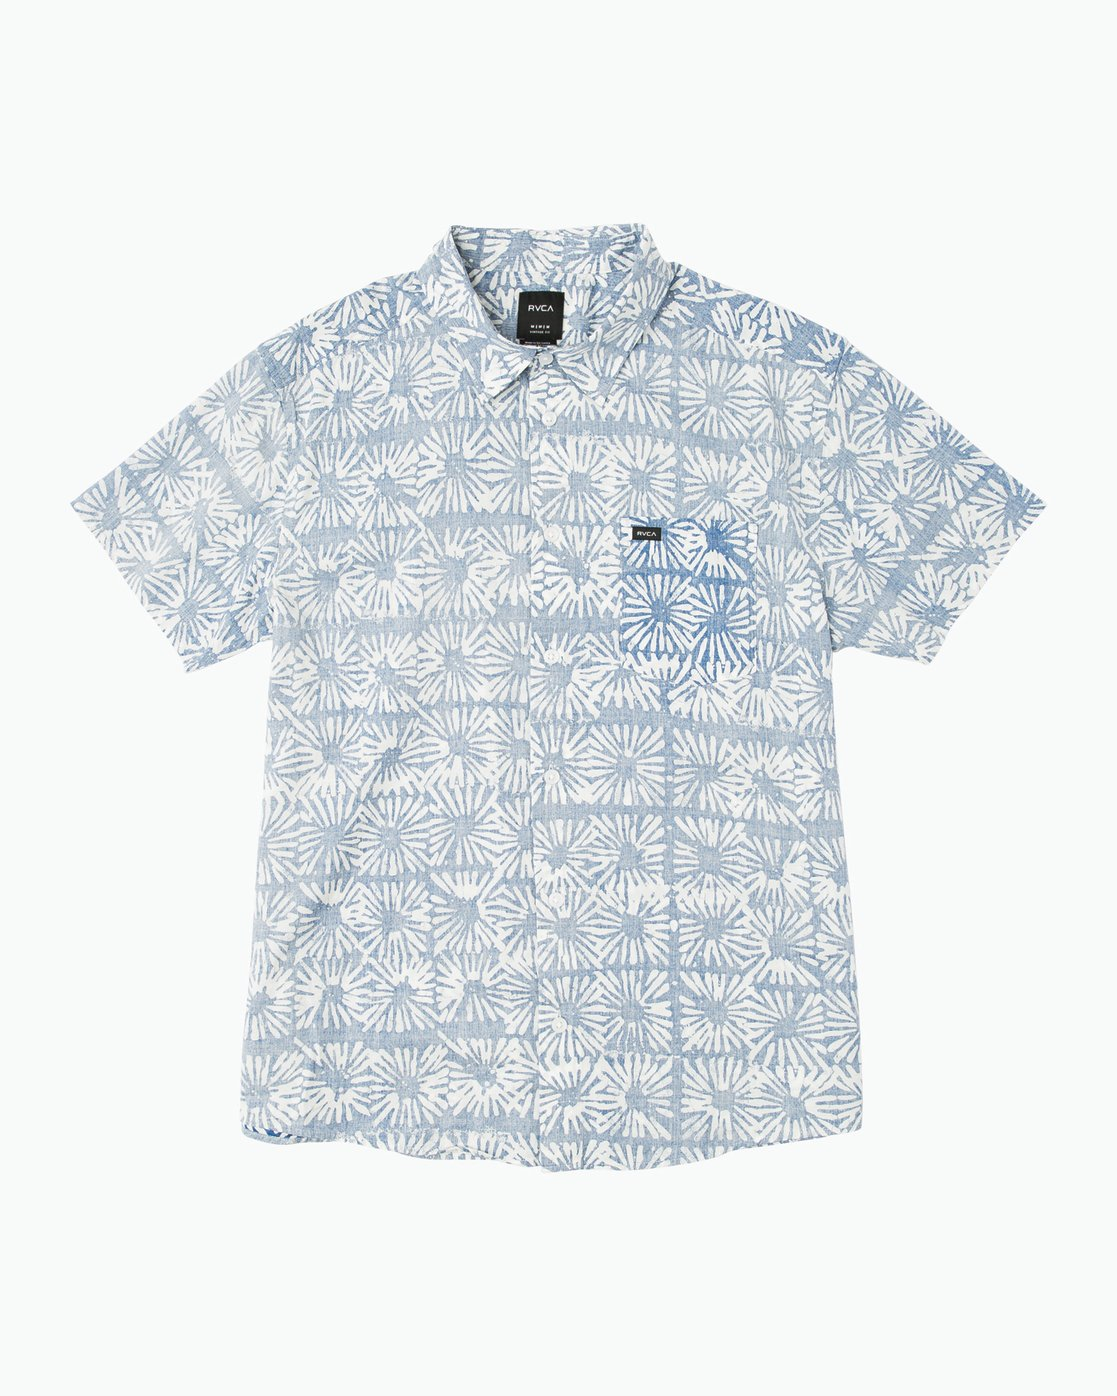 Flower Block Printed Button-Up Shirt M509PRFB | RVCA